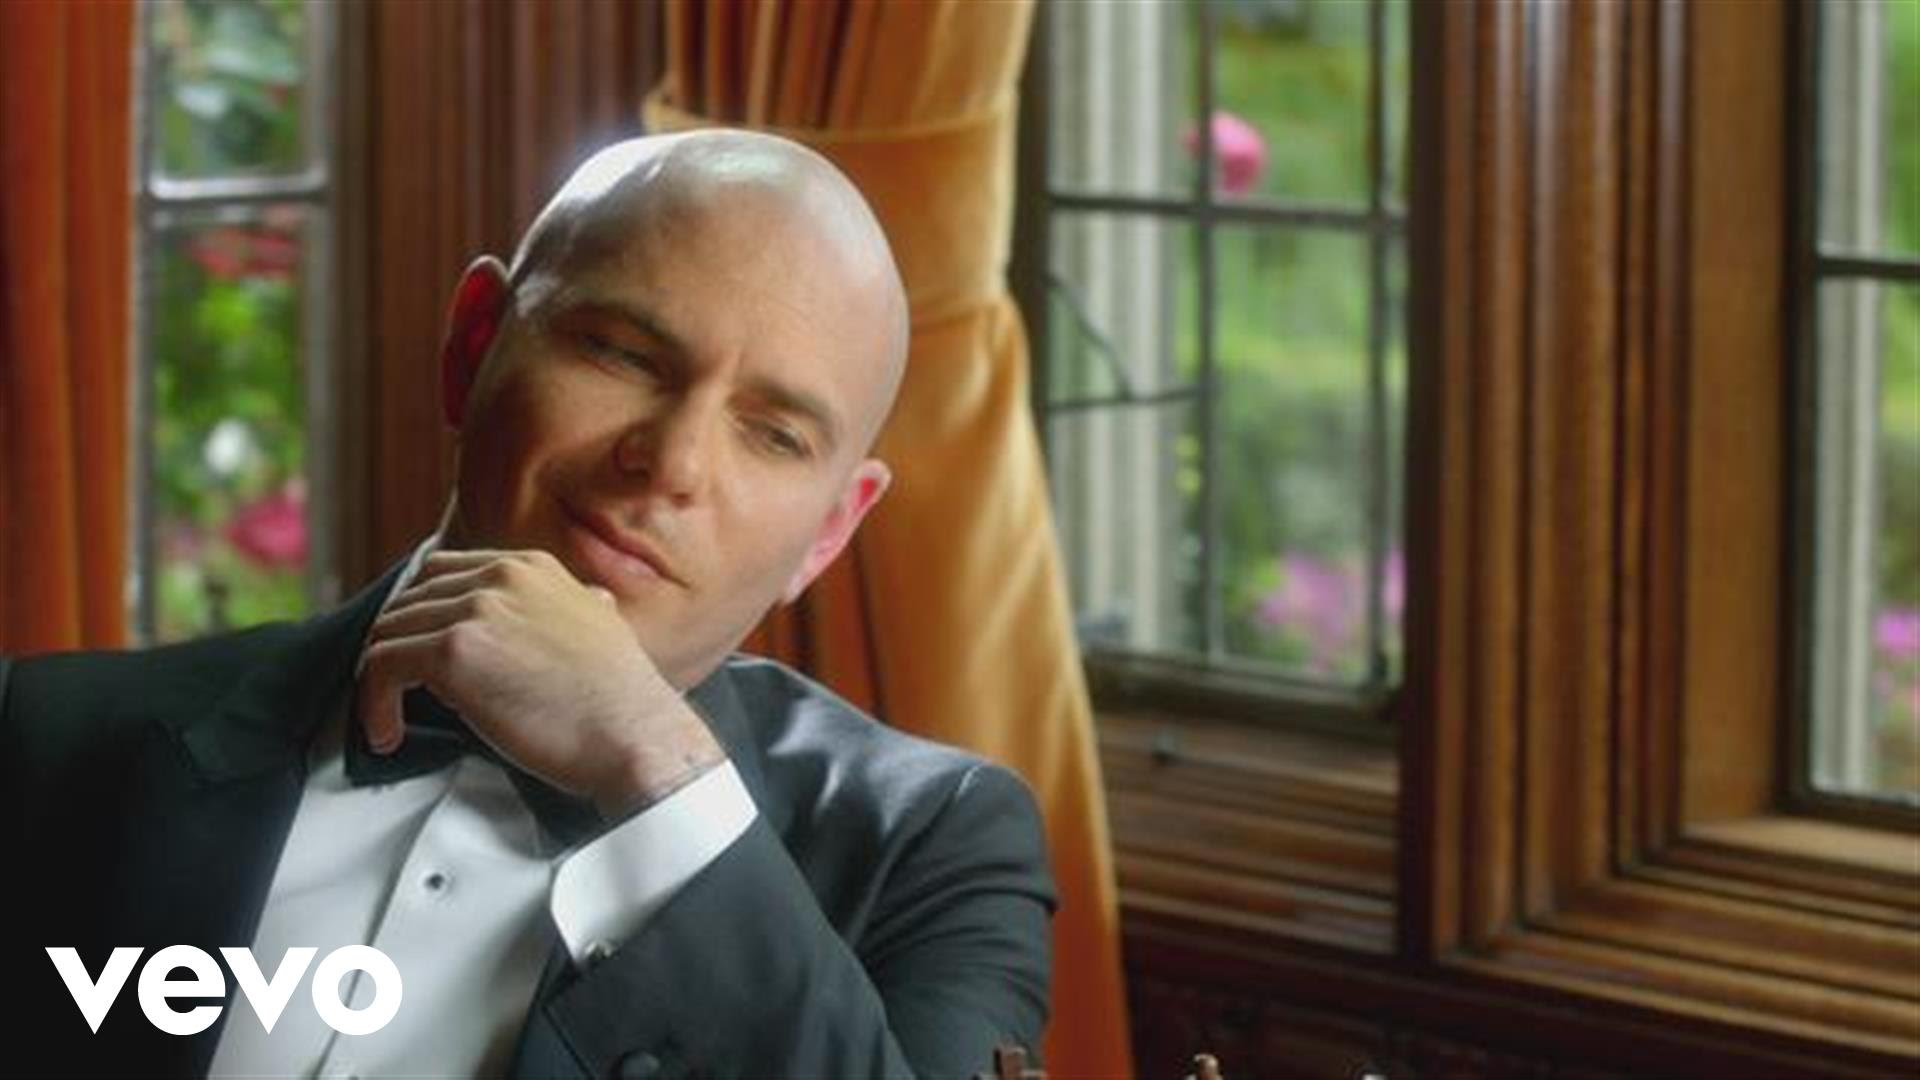 Богатый папа бедный папа слушать онлайн